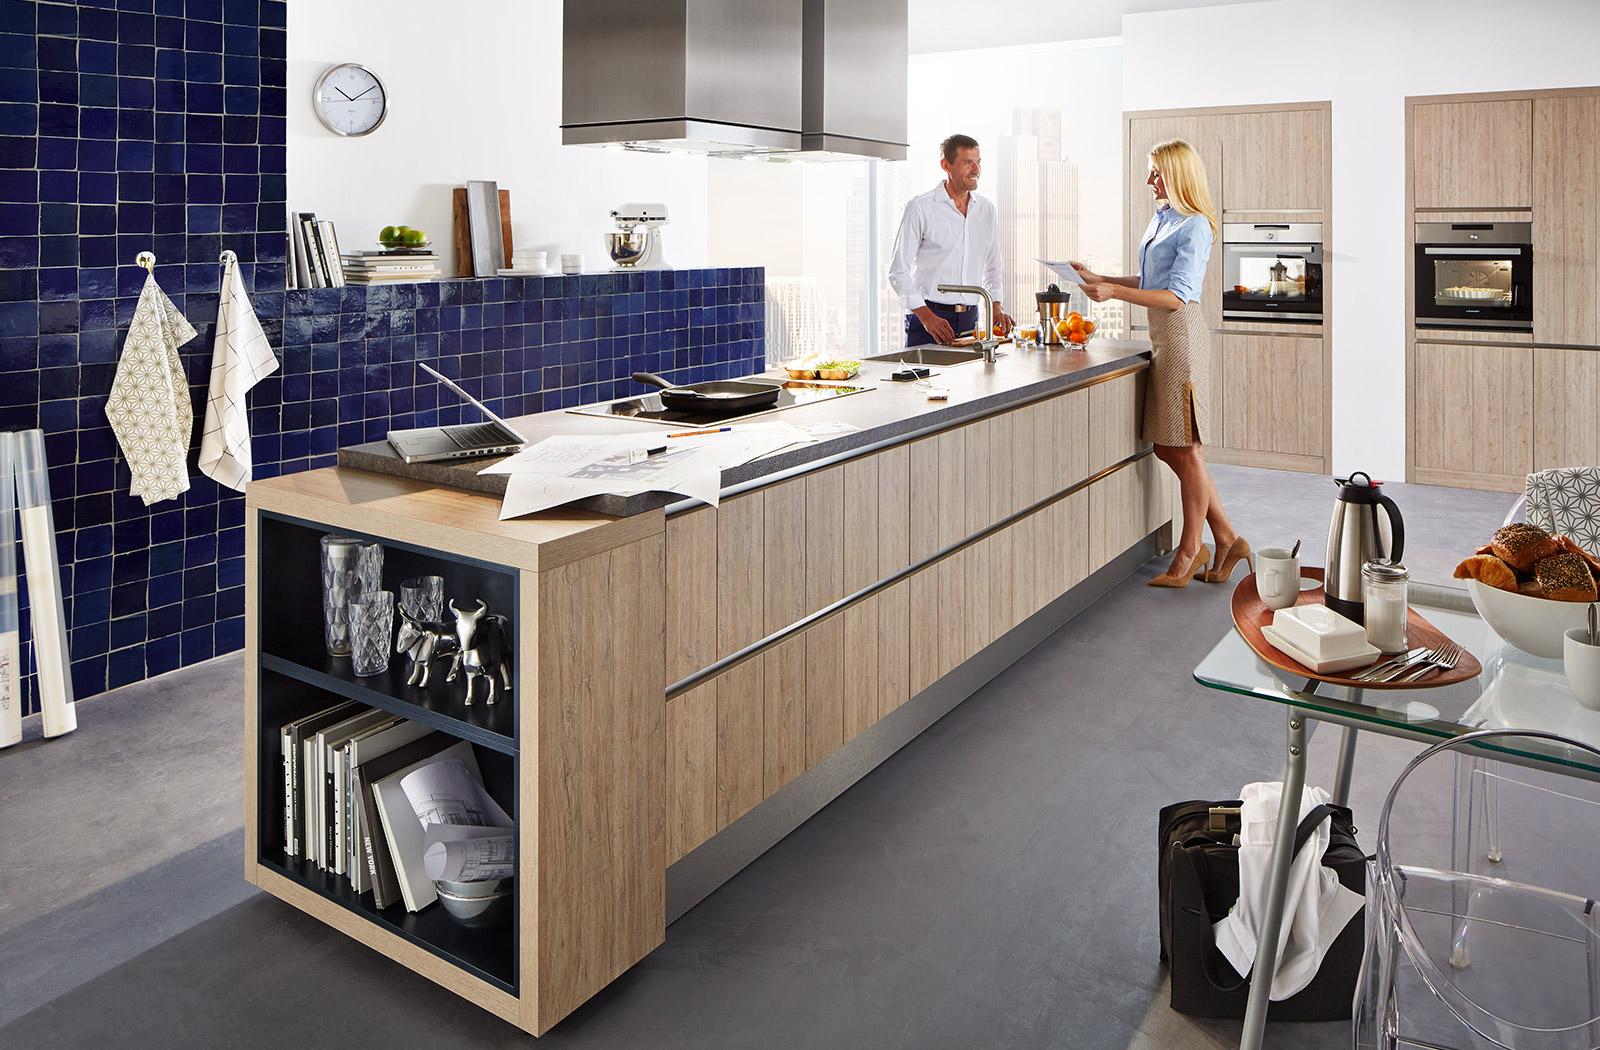 cuisine h cker k chen cuisine bullition 4 bd de la libert 35600 redon 02 99 72 49 32. Black Bedroom Furniture Sets. Home Design Ideas